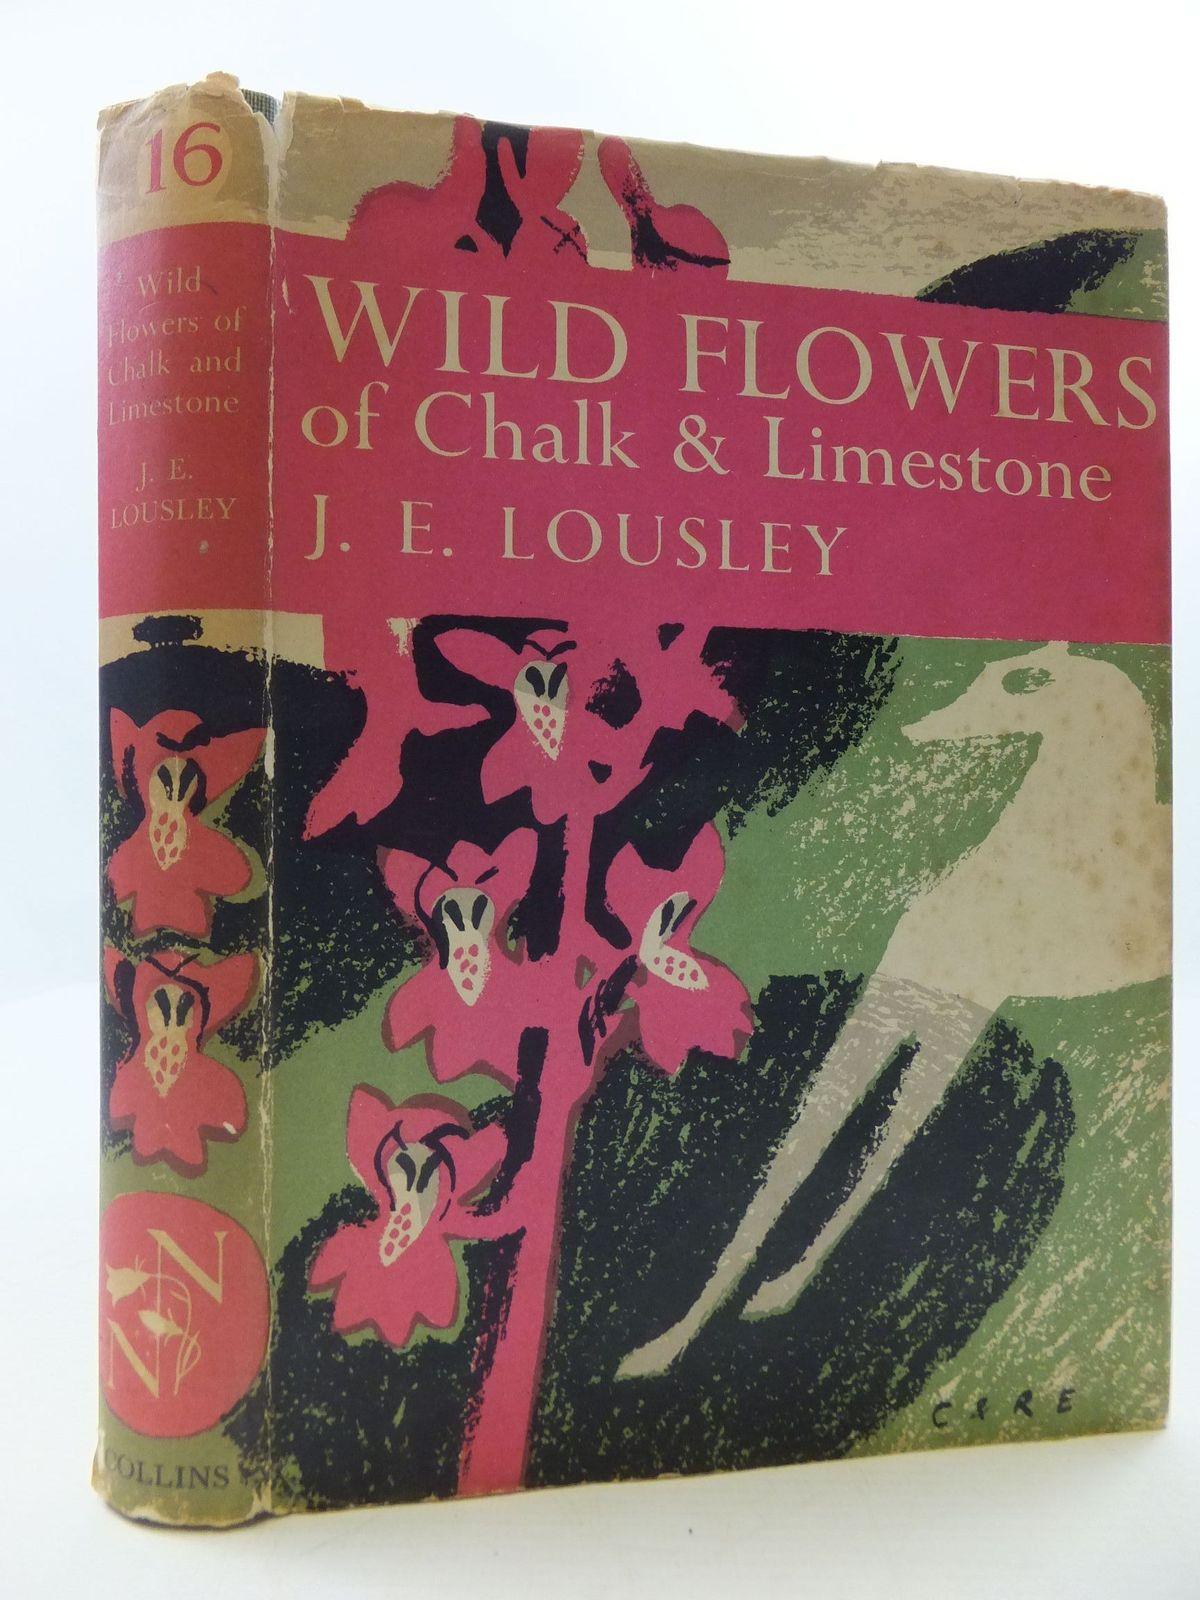 Photo of WILD FLOWERS OF CHALK & LIMESTONE (NN 16)